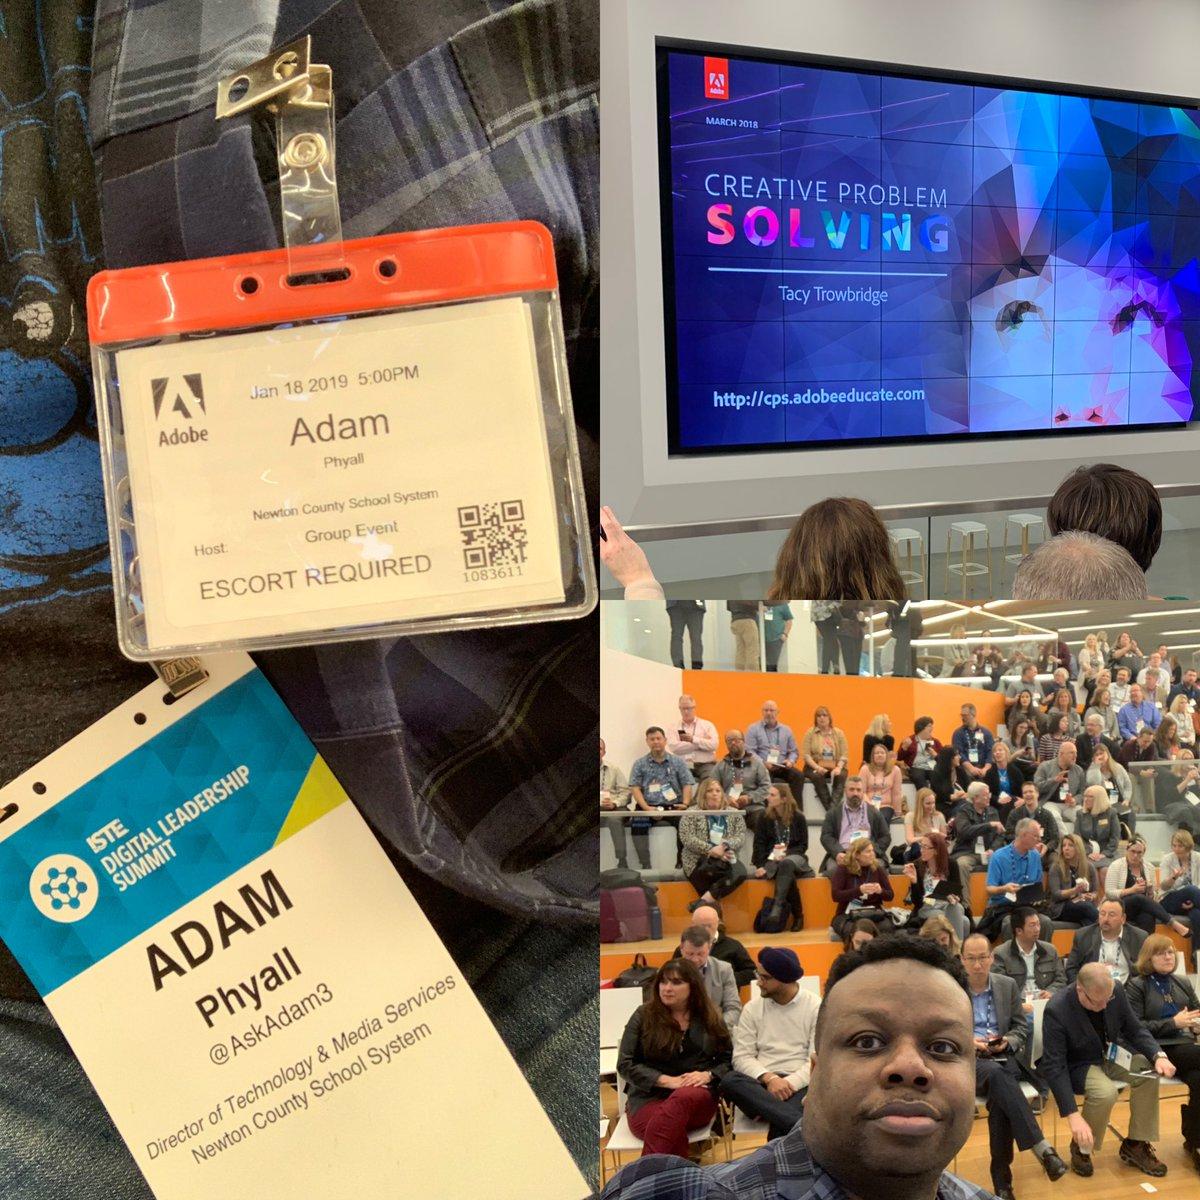 I had a great day one @iste Digital Leadership Summit #ISTEDLS @AdobeEdu @AdobeSpark